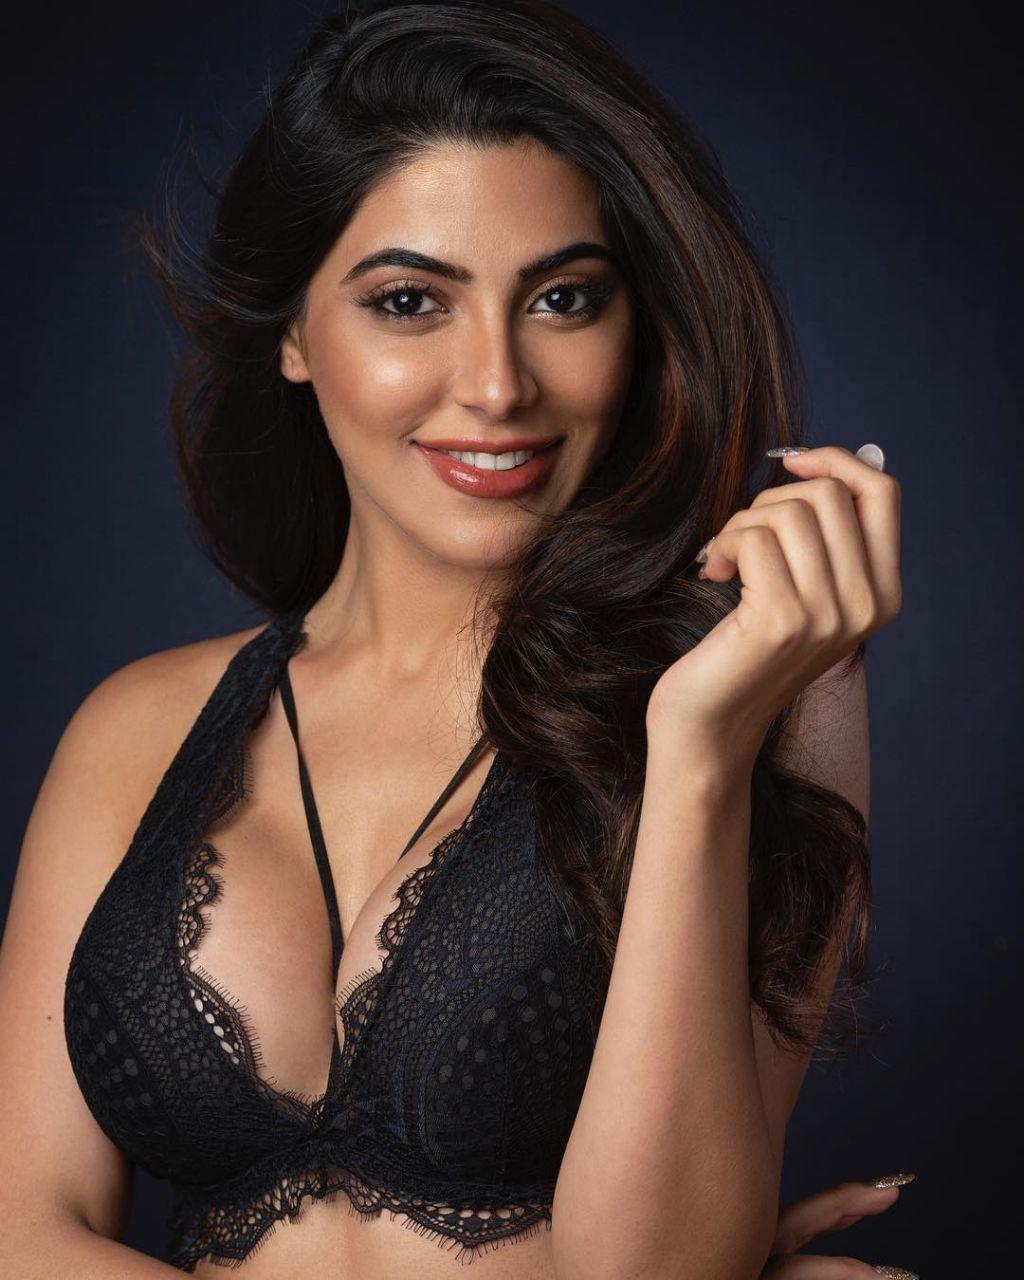 Nikki Tamboli in Black Lingerie Smiling Beauty HD Pics Must See